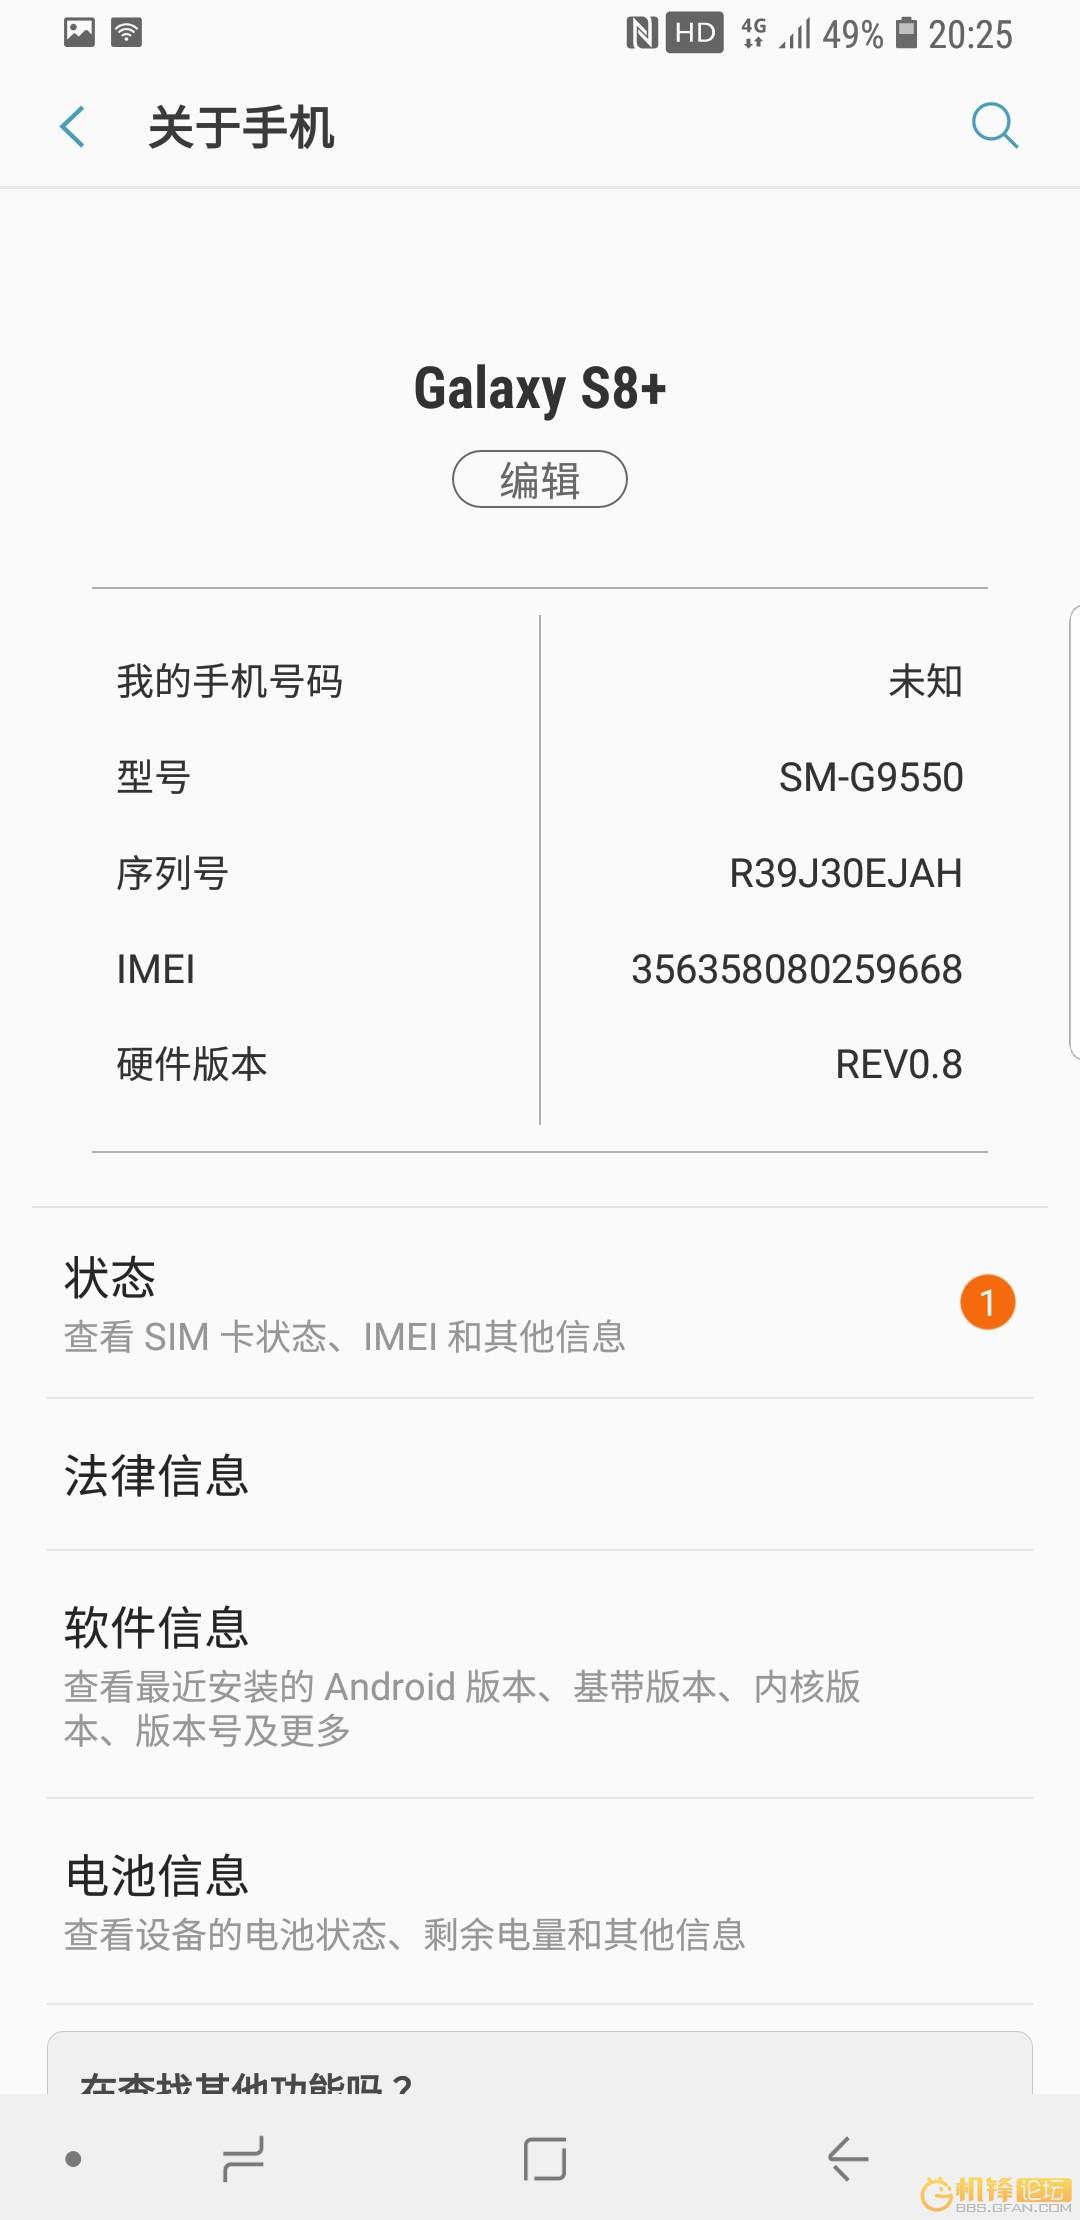 Screenshot_Settings_20171225-202523.jpg